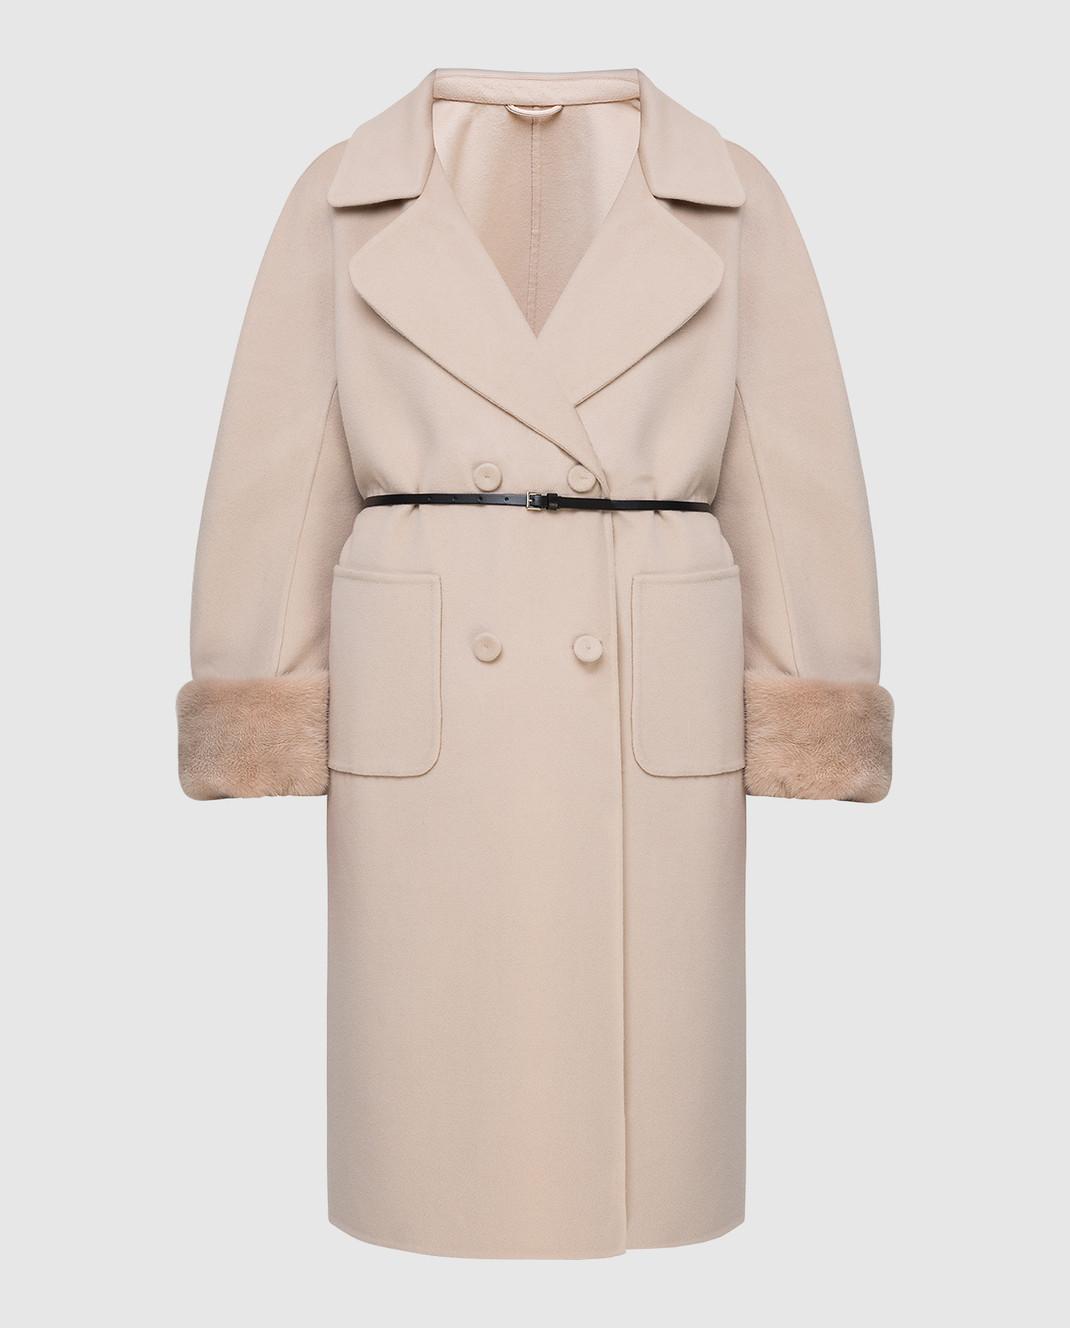 Ermanno Scervino Бежевое пальто из шерсти изображение 1